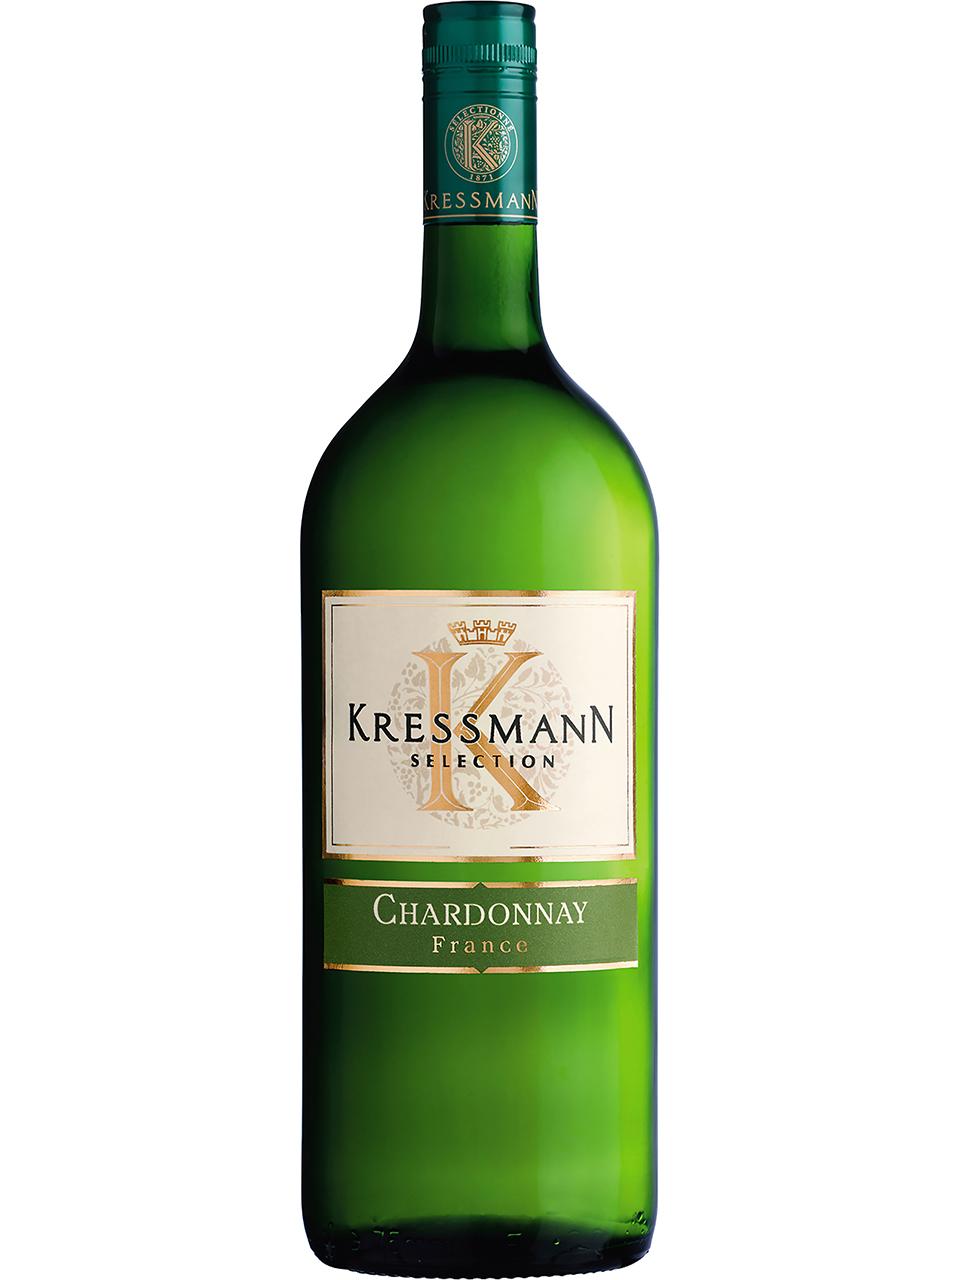 Kressmann Selection Chardonnay